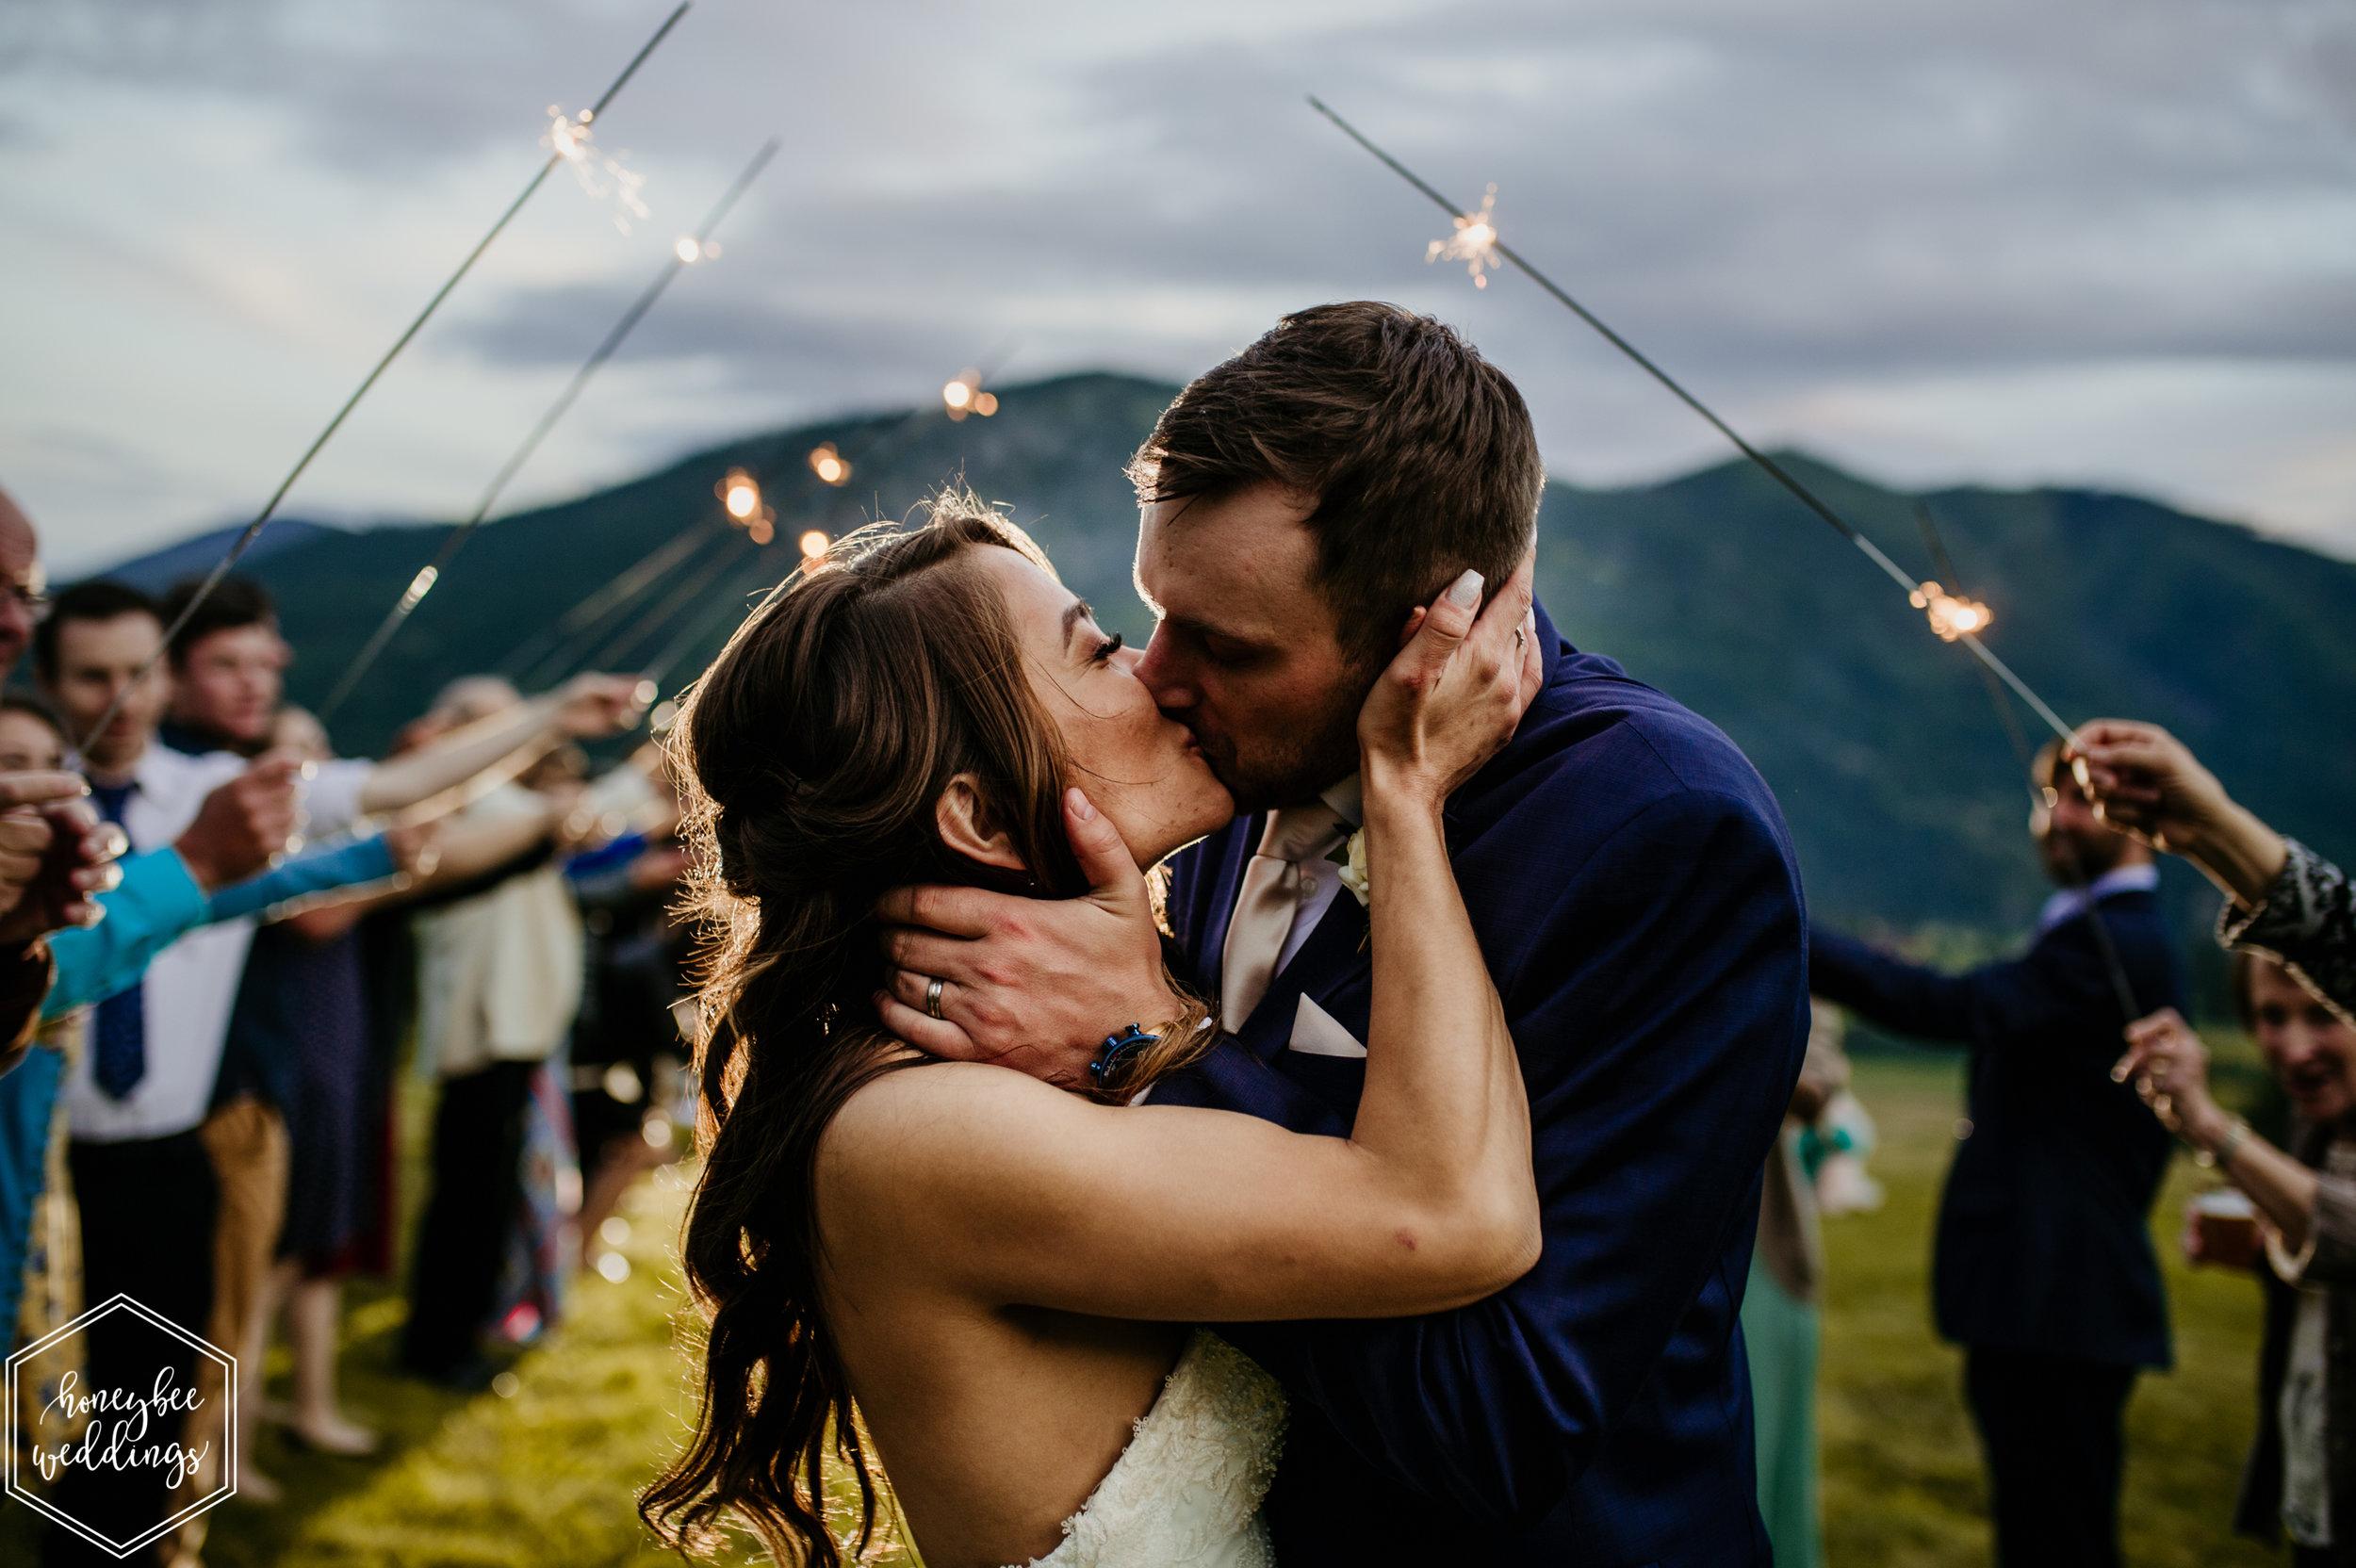 406Montana Wedding Photographer_Missoula Wedding_Honeybee Weddings_Devlin & Jacob_June 22, 2019-2517.jpg